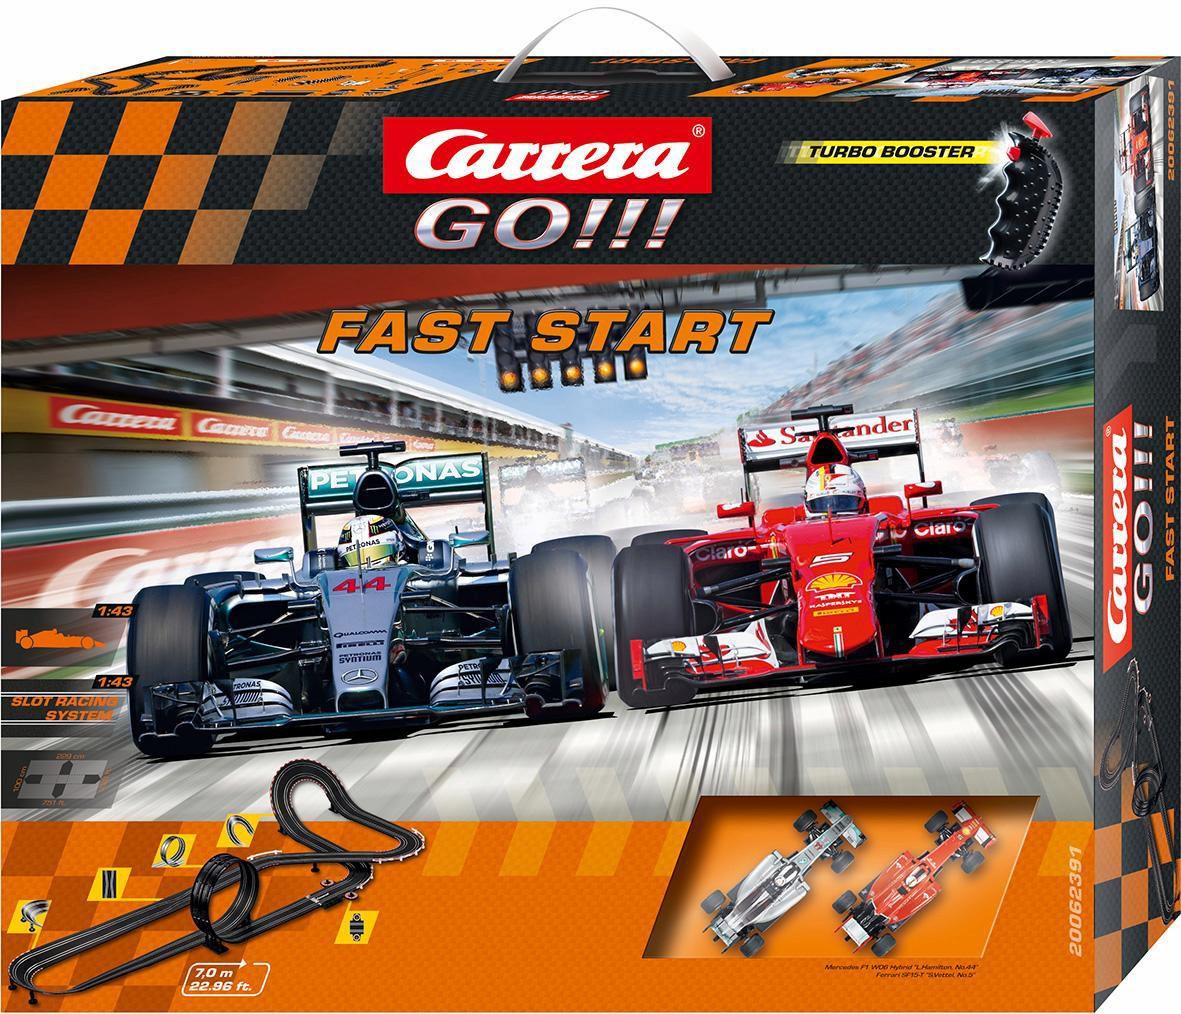 CARRERA Carrera Autorennbahn, »Carrera® GO!!!, Fast Start«